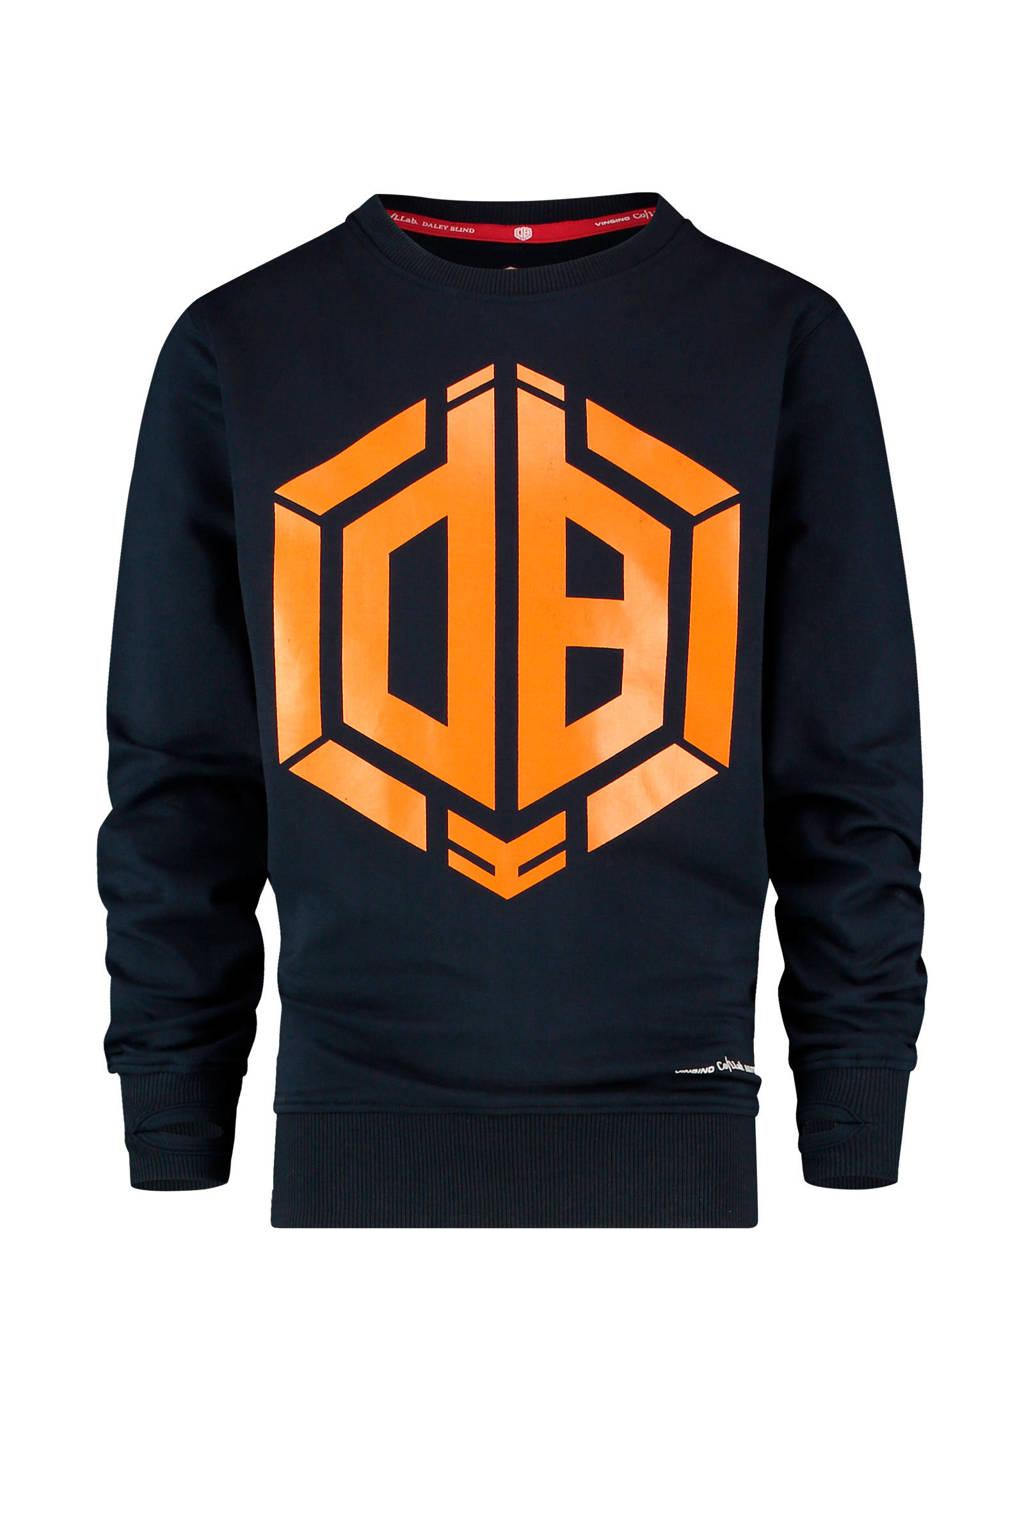 Vingino Daley Blind sweater Niek met logo donkerblauw/oranje, Donkerblauw/oranje